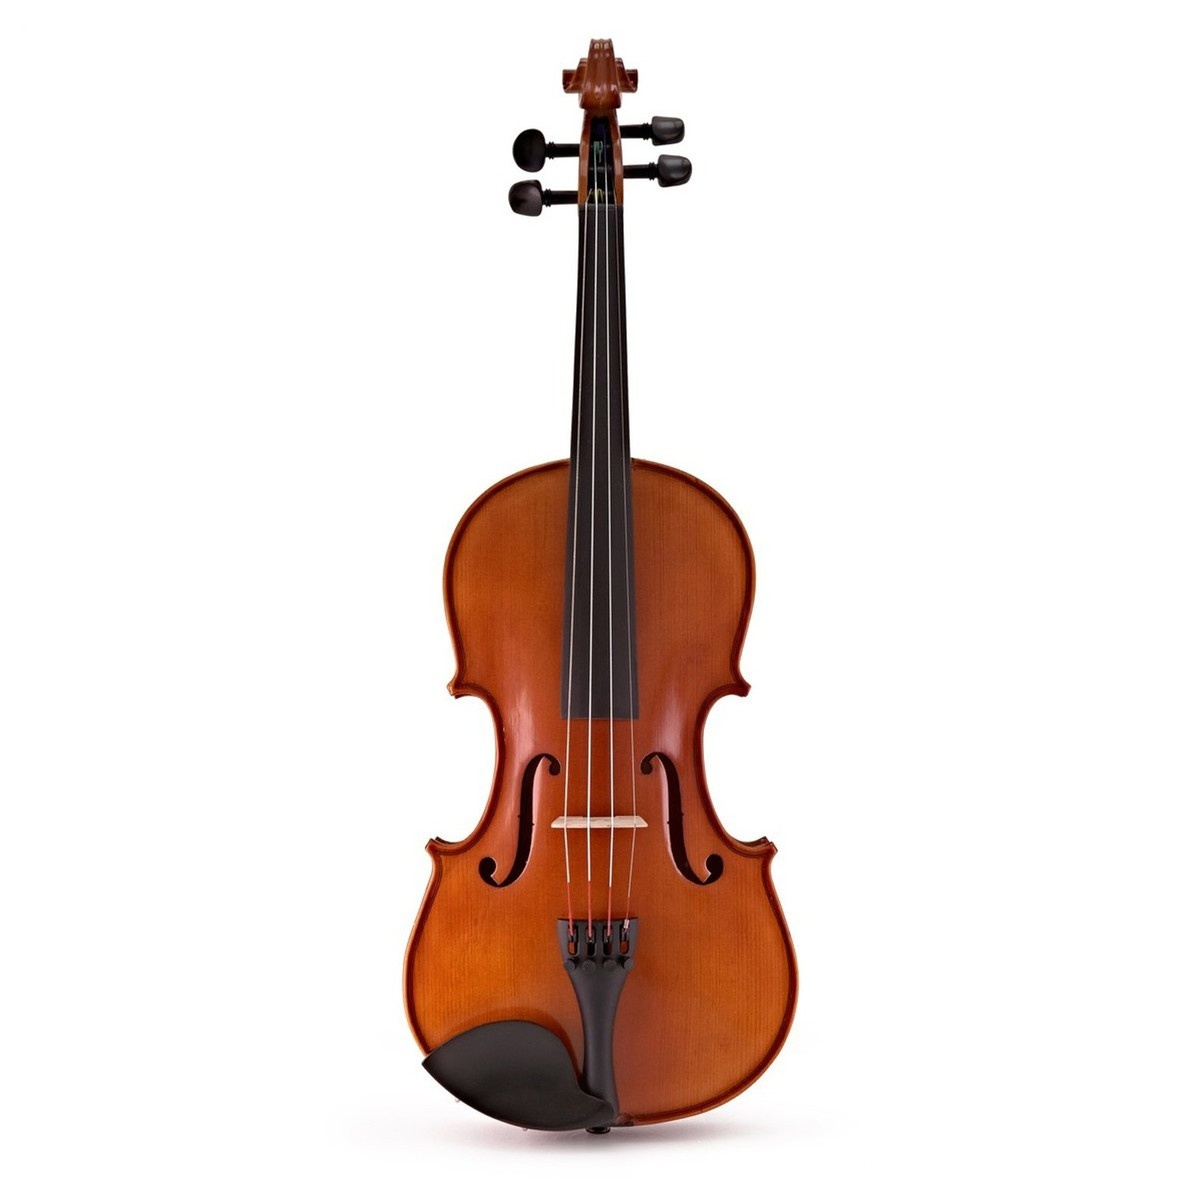 Hindersine Hidersine Vivente Violin Outfit, 3/4 Size